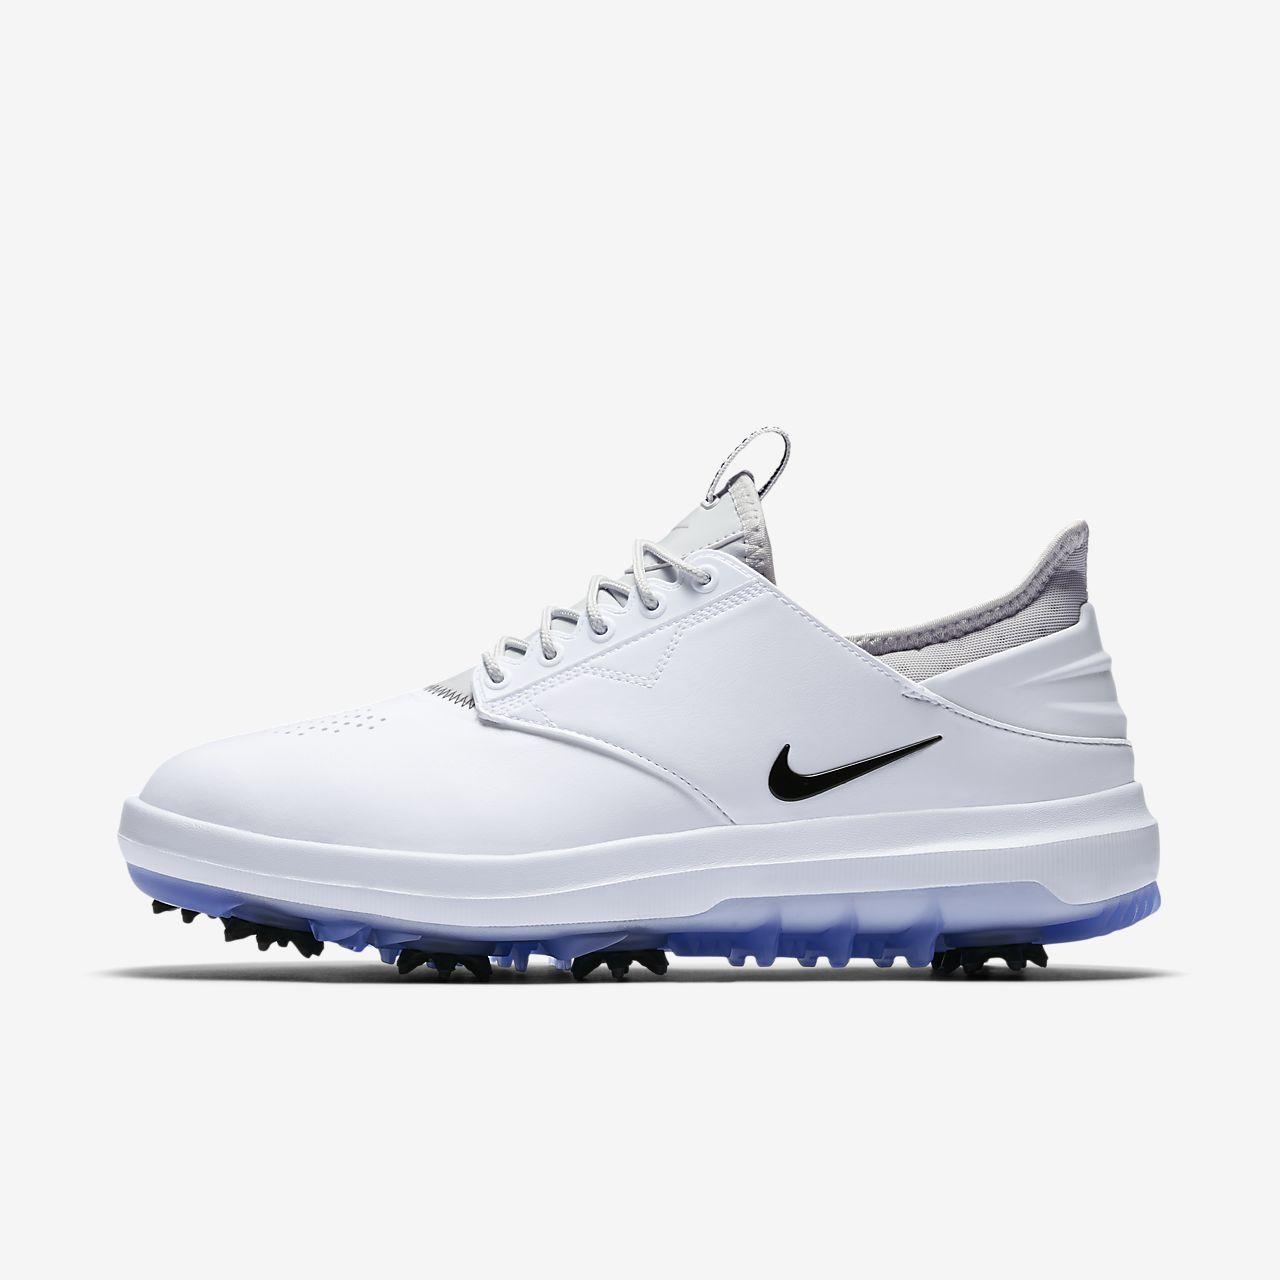 official photos 1f622 827a2 ... Golfsko Nike Air Zoom Direct för män